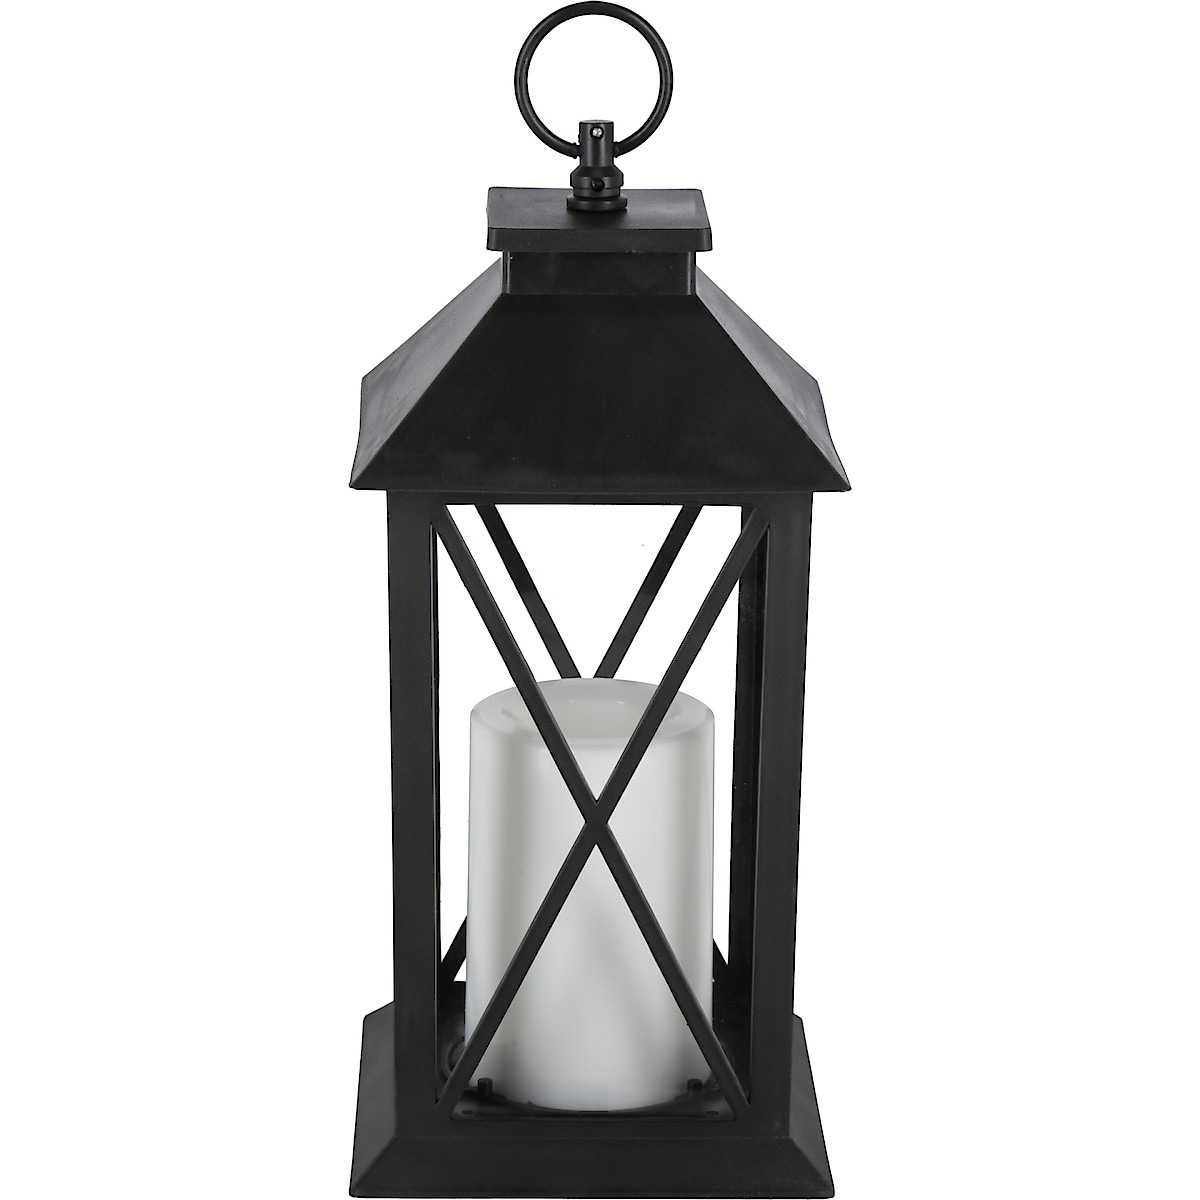 LED Candle Lantern with Timer